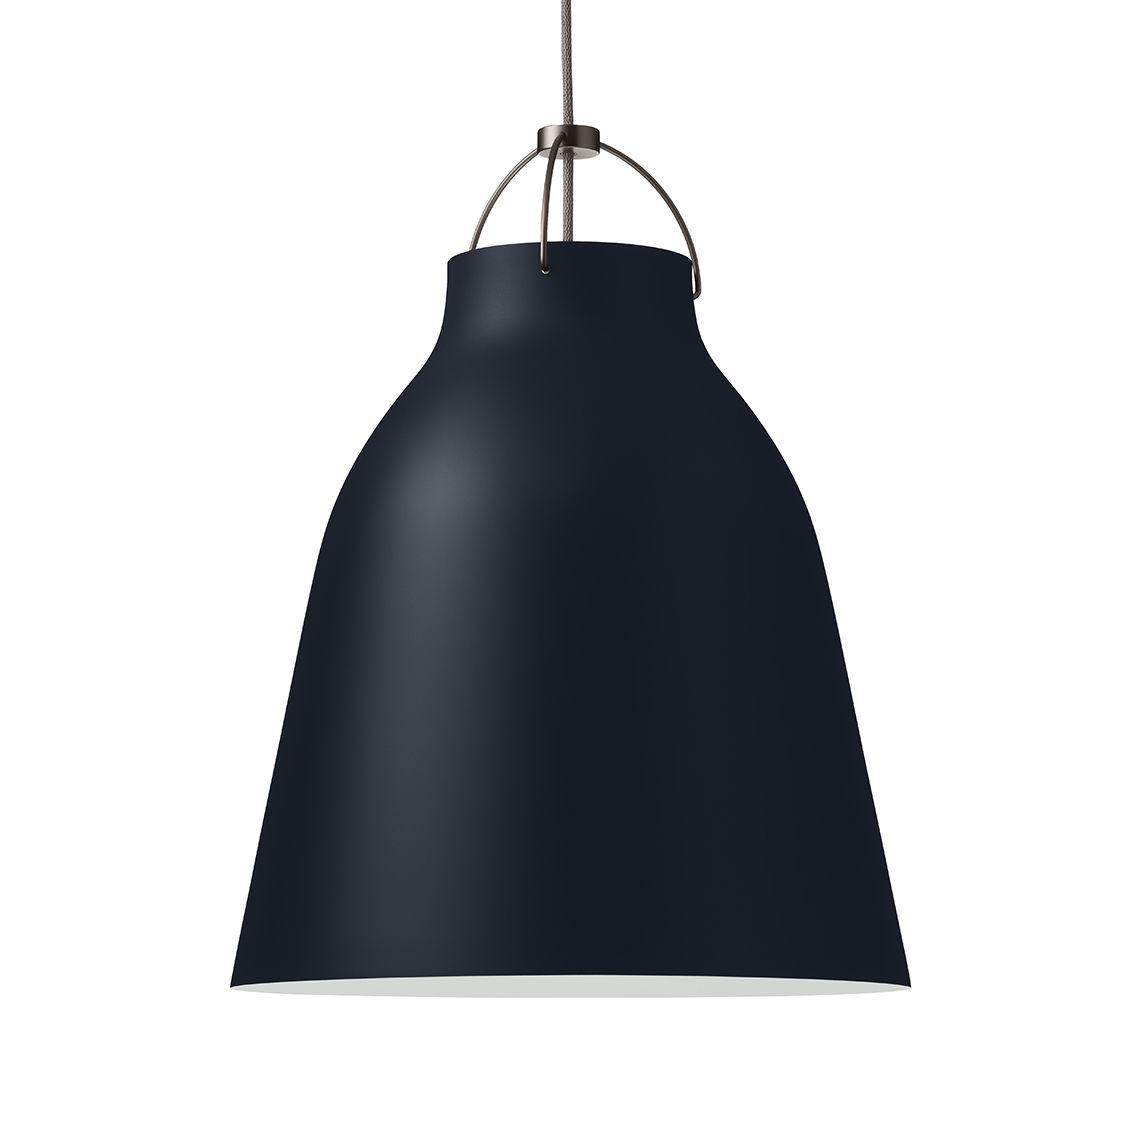 Caravaggio hanglamp Lightyears Ø40 Dark Ultramarine